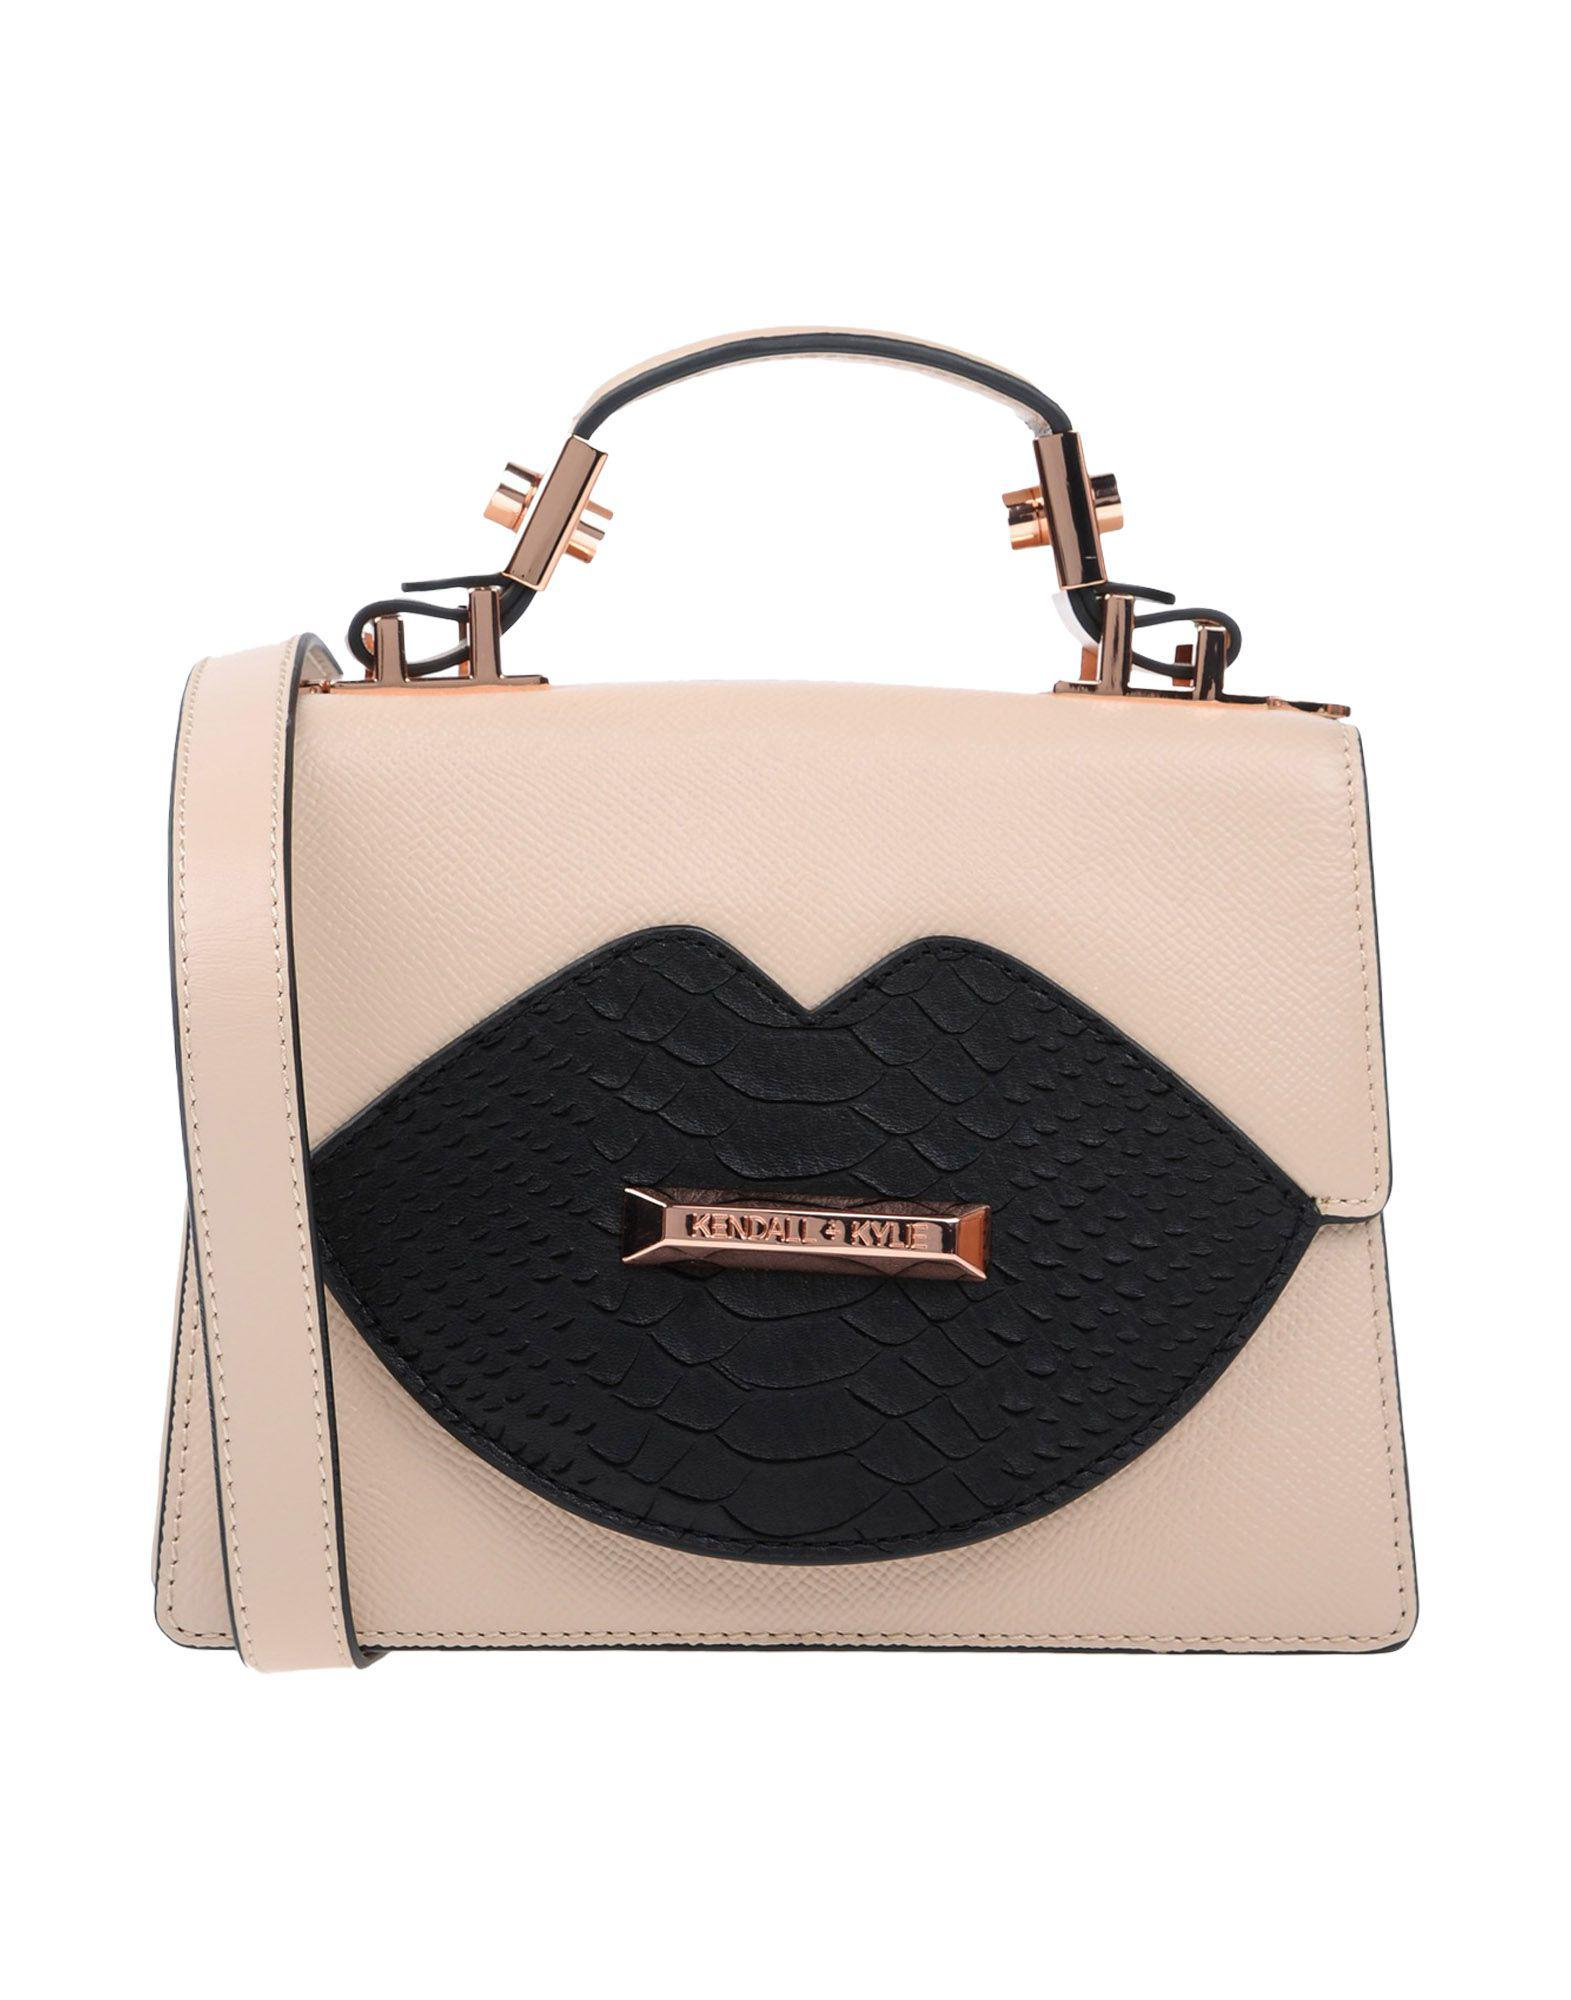 Kendall + Kylie HANDBAGS - Shoulder bags su YOOX.COM W5svgbN